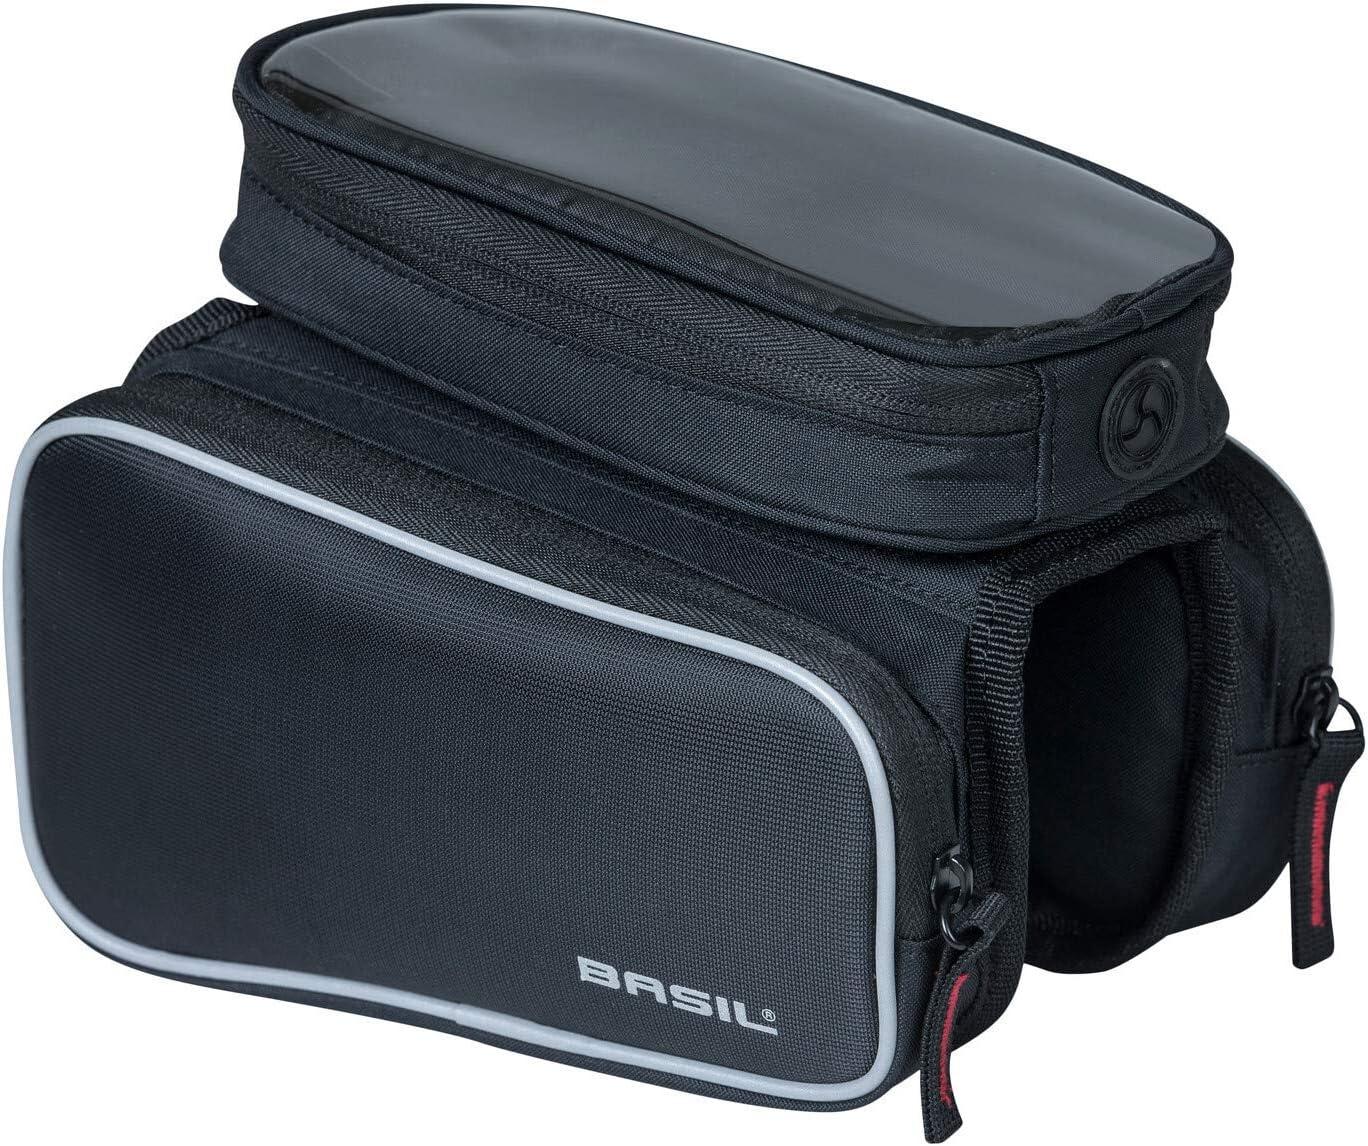 Cheap mail Direct sale of manufacturer order shopping Basil Unisex– Adult's Rahmentasche-2179225350 Black case Frame